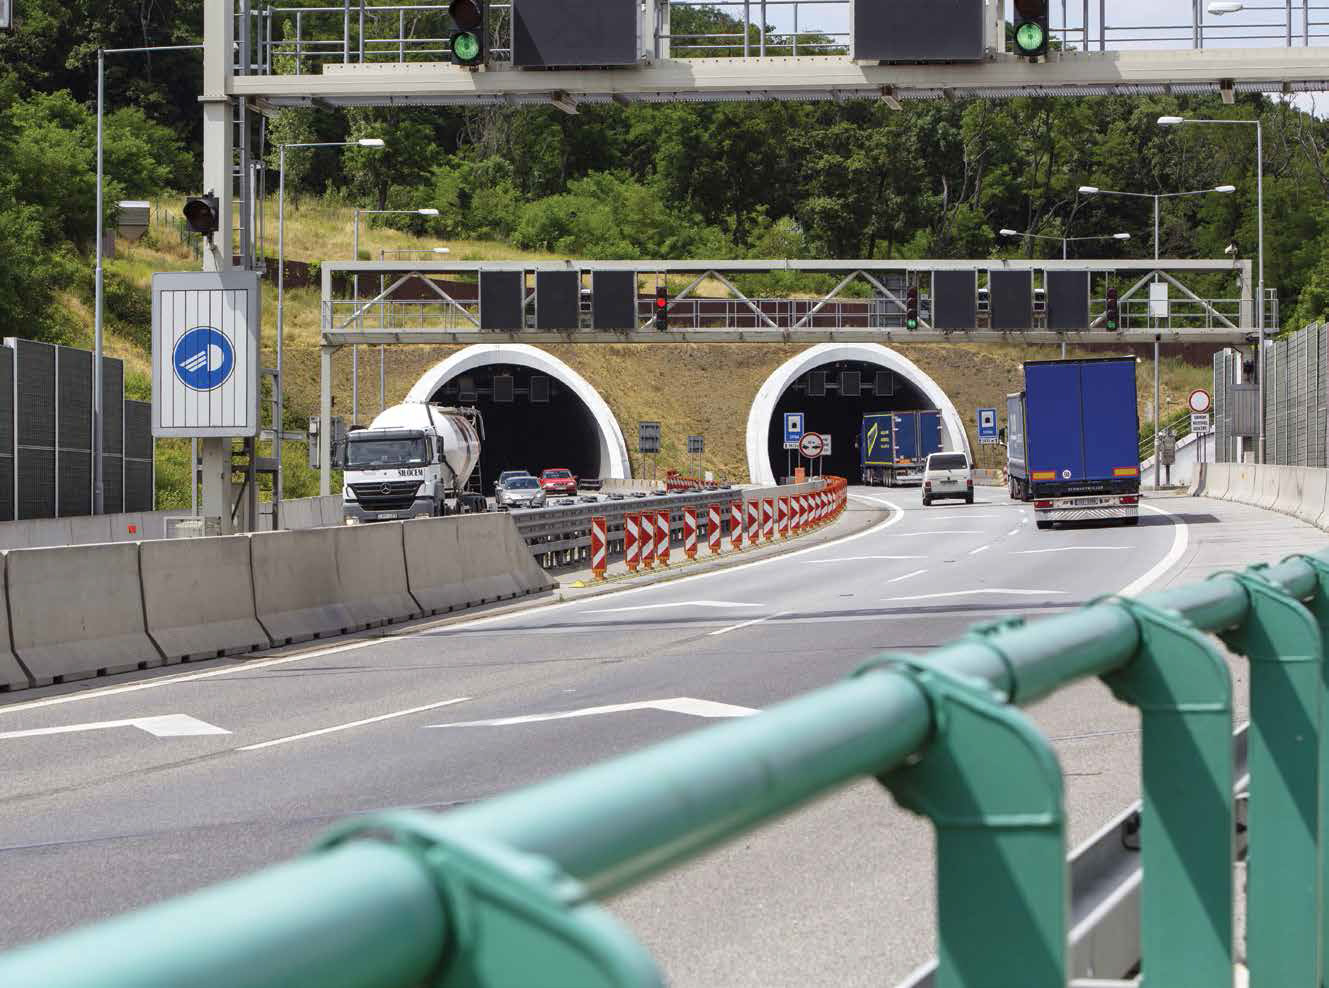 Diaľnica D2 Bratislava, Lamačská cesta – Staré grunty - Tunel Sitina